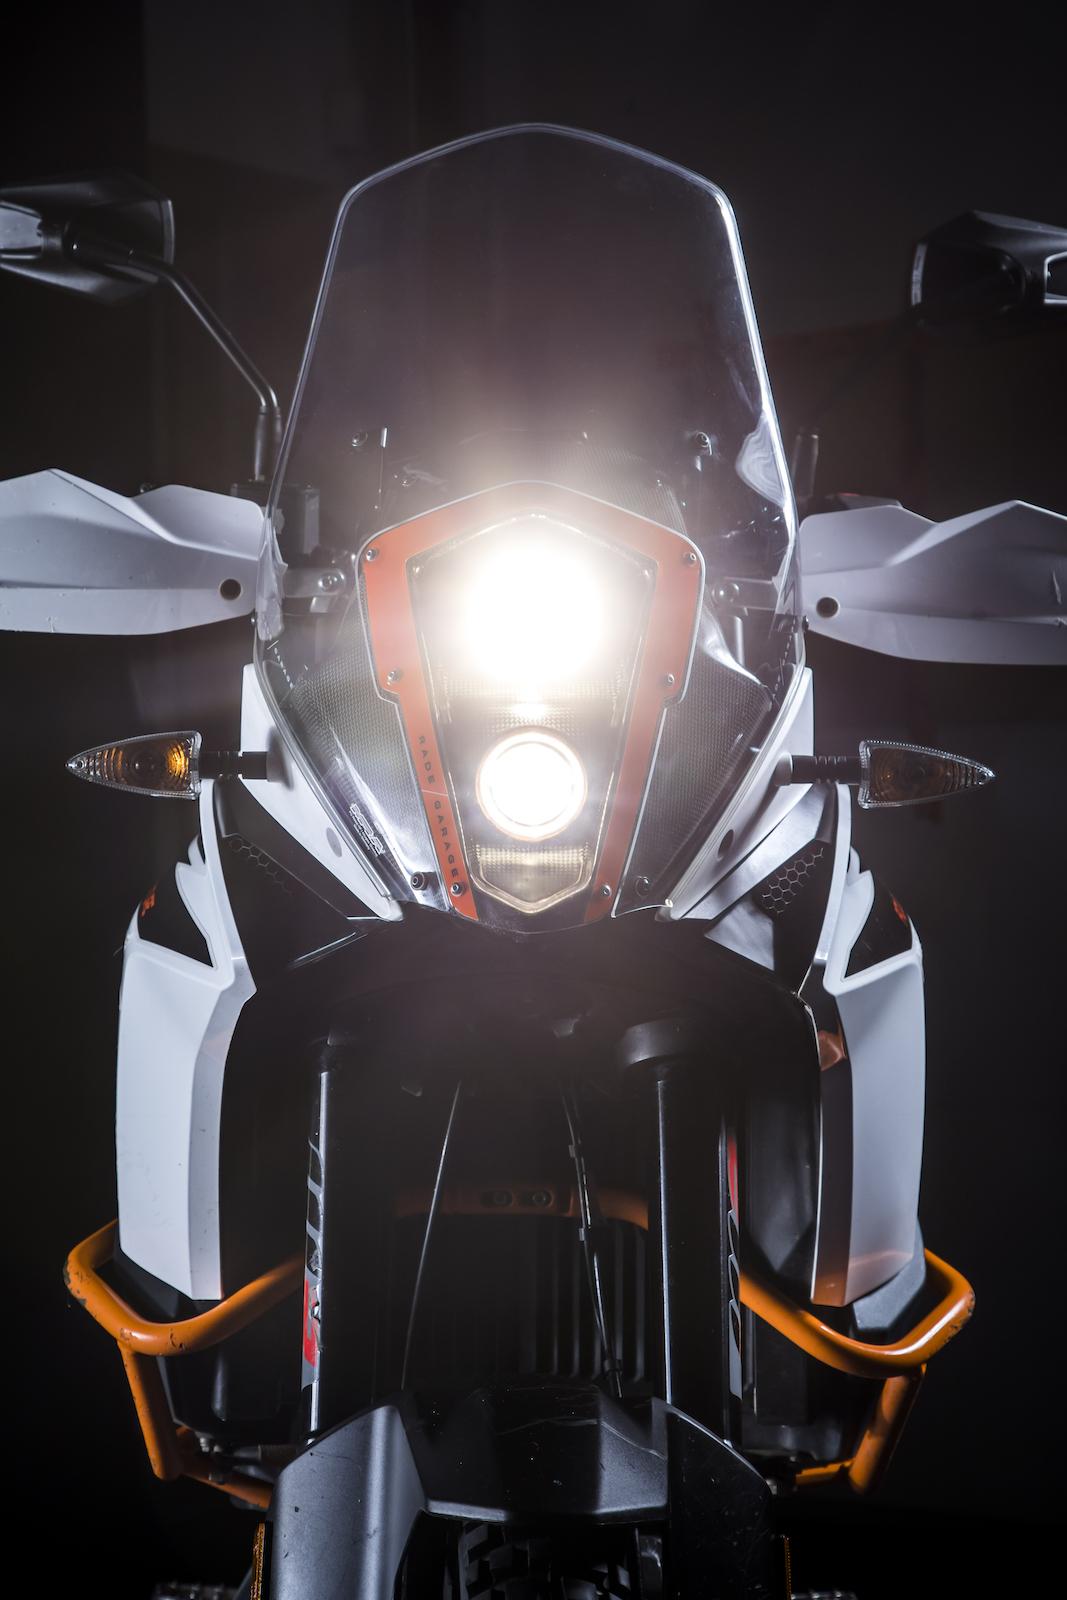 Enduro motocykl KTM